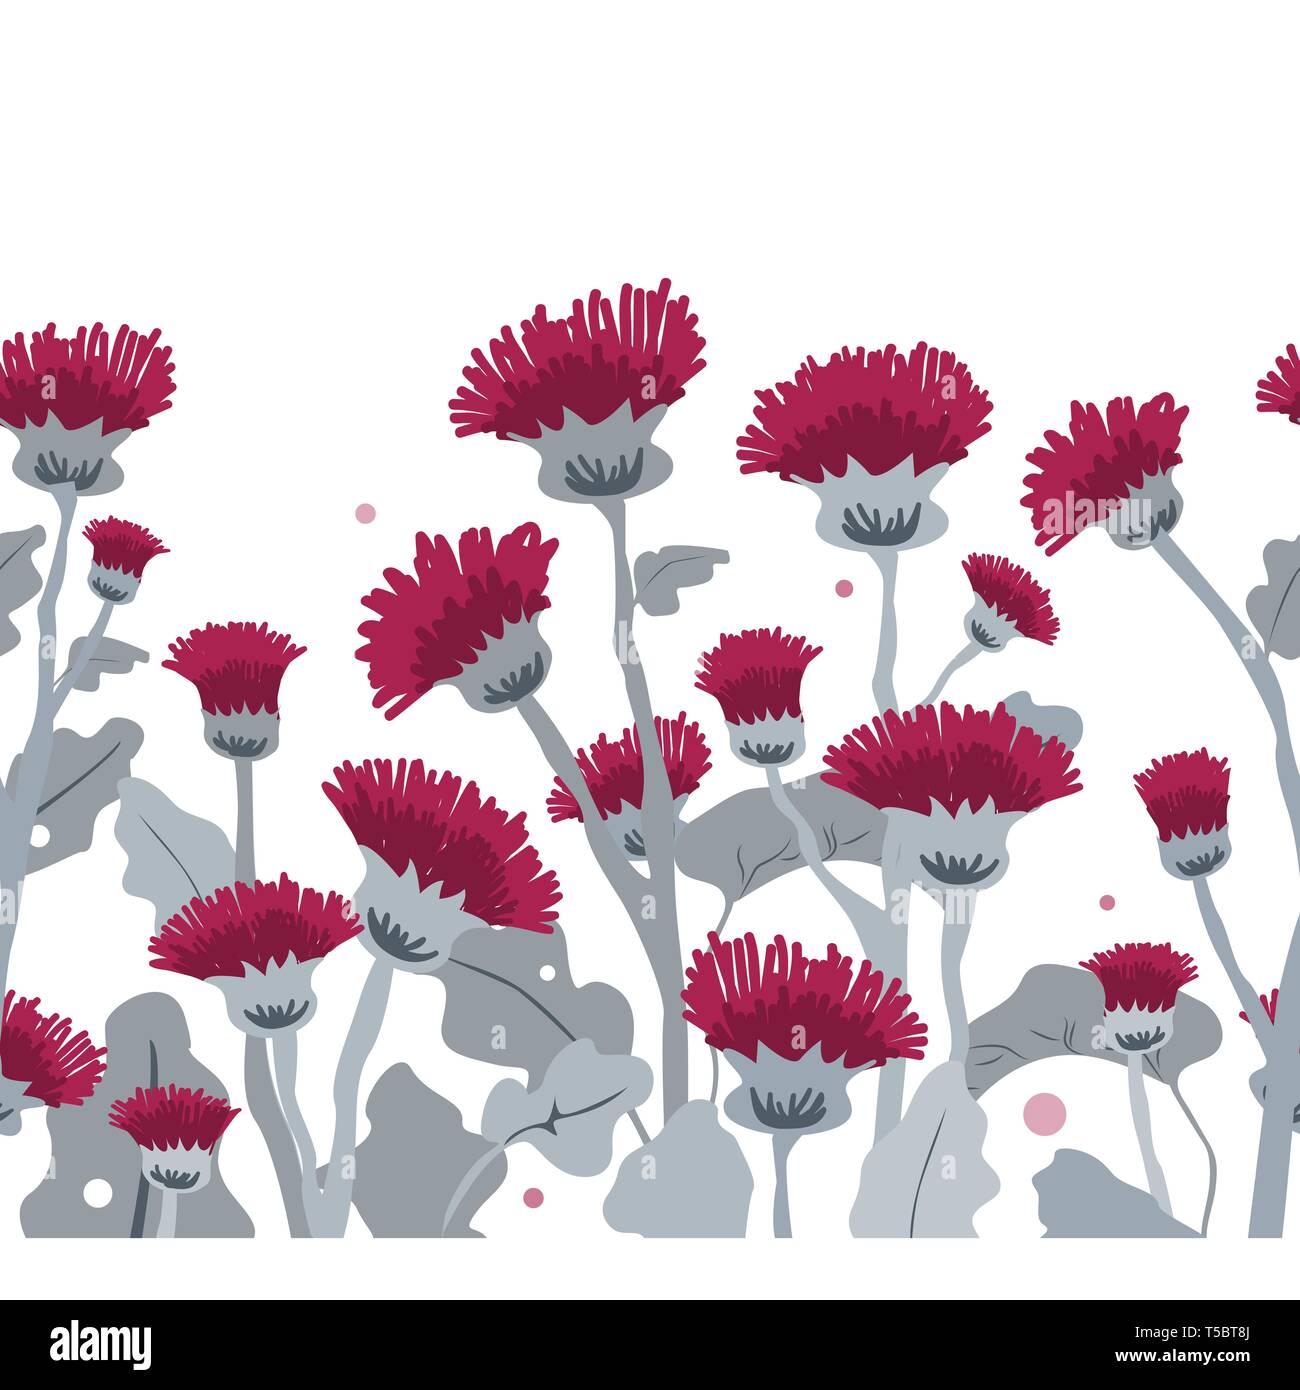 Thistle. Vector seamless border pattern. Hand drawn cartoon illustration on a white - Stock Image